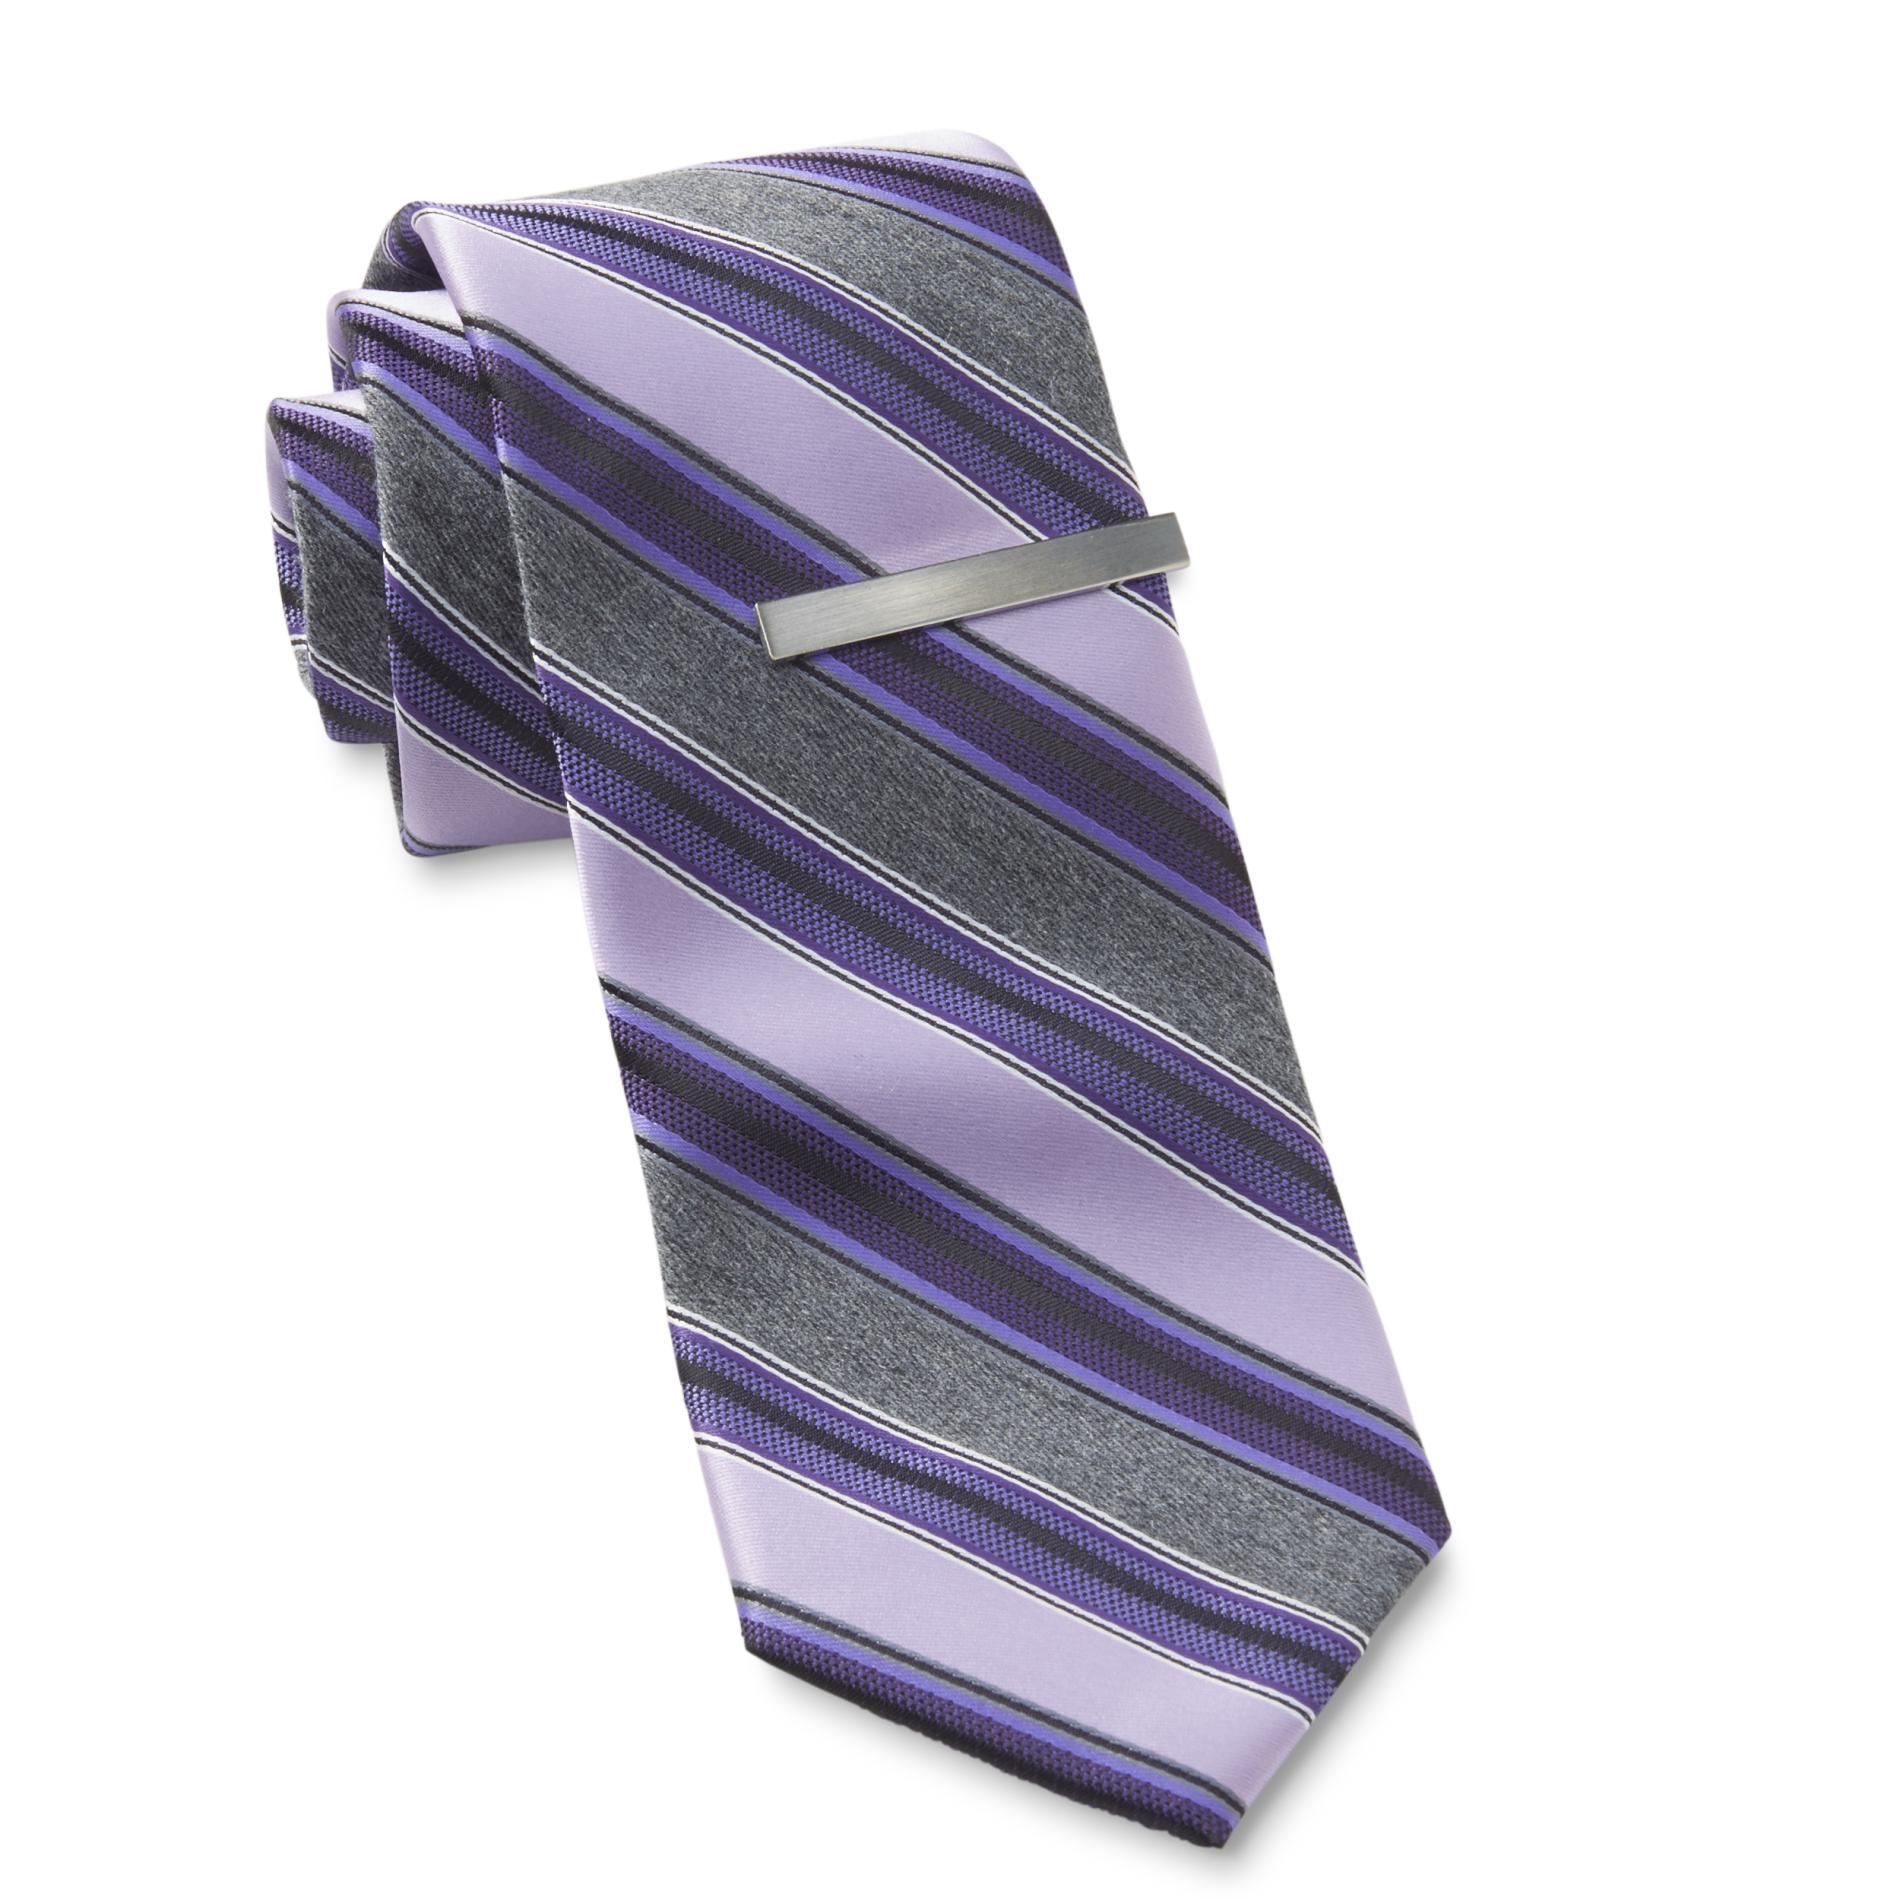 Structure Men's Necktie & Tie Bar - Striped PartNumber: 045VA91429512P MfgPartNumber: 64117001